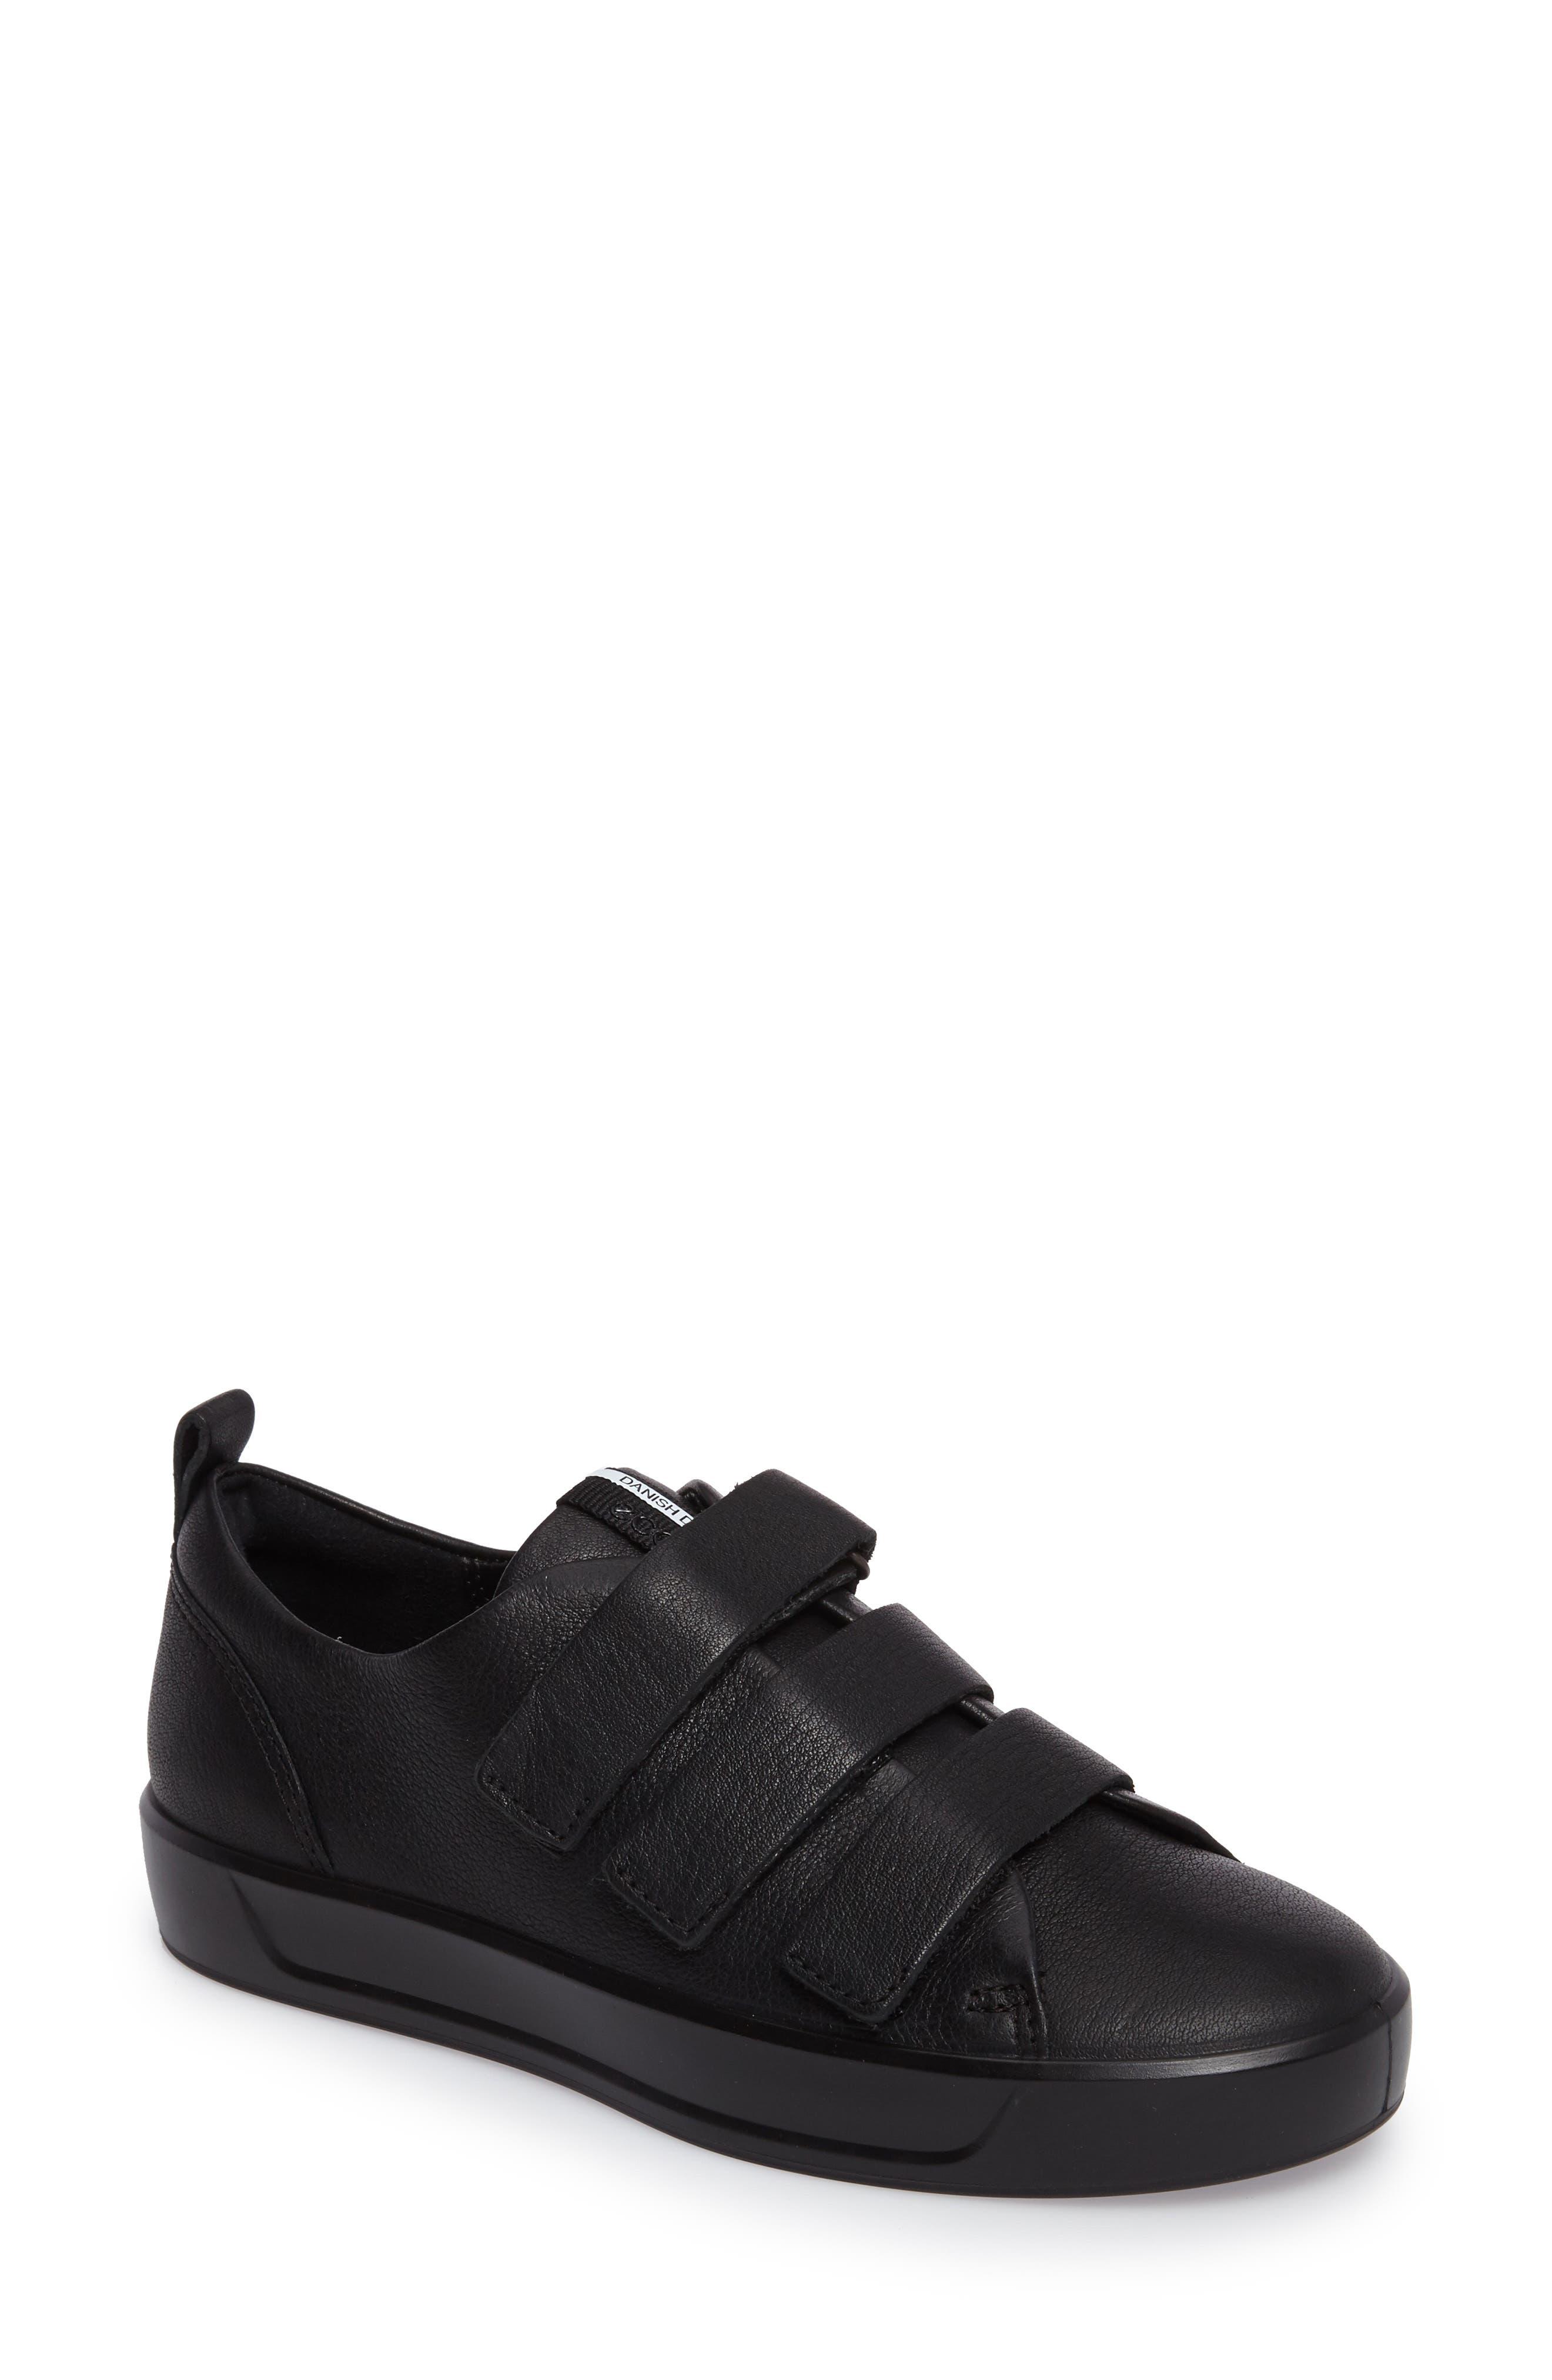 Alternate Image 1 Selected - ECCO Soft 8 Sneaker (Women)